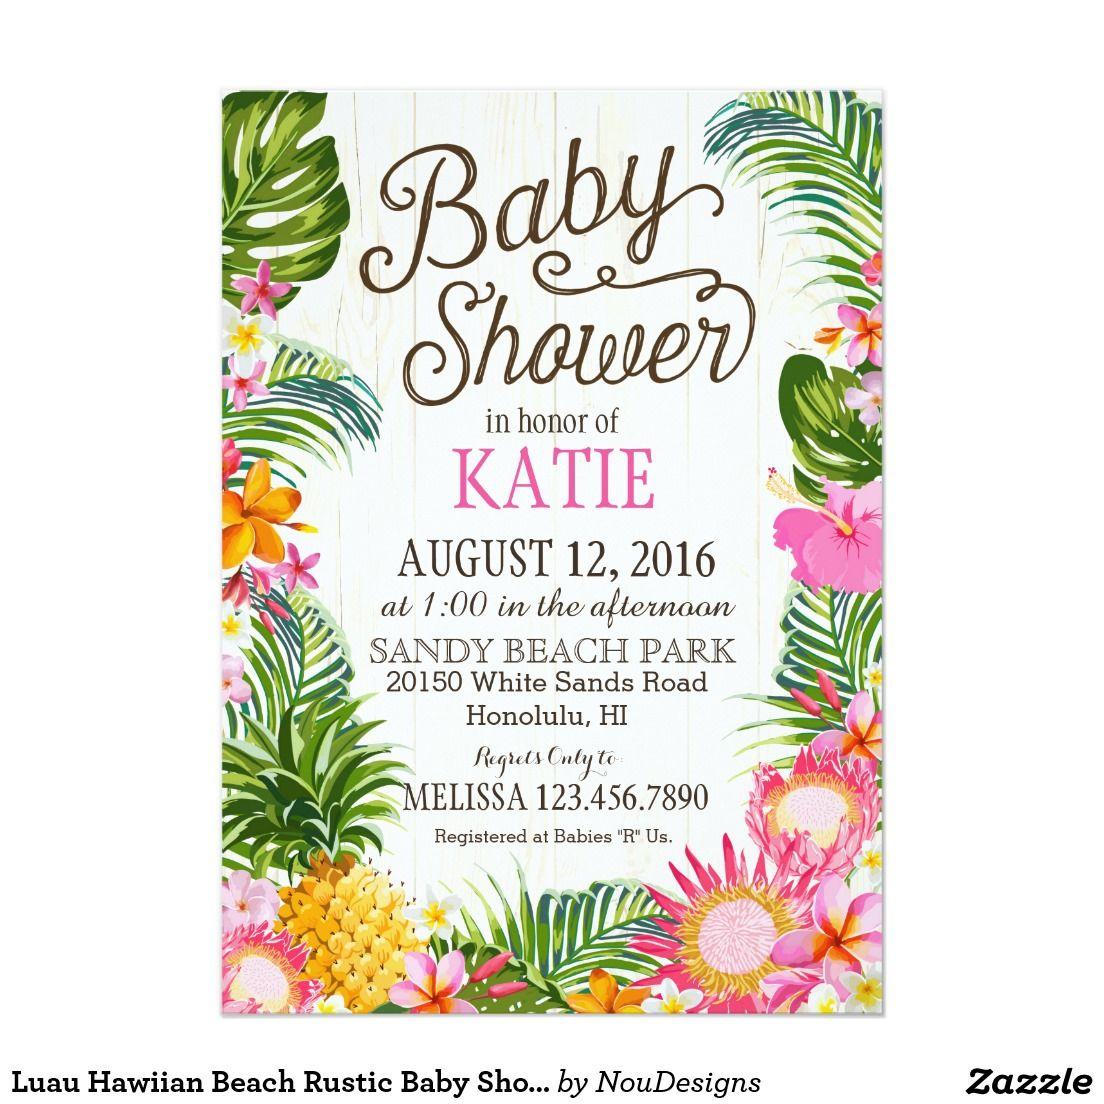 Luau Hawiian Beach Rustic Baby Shower 5\